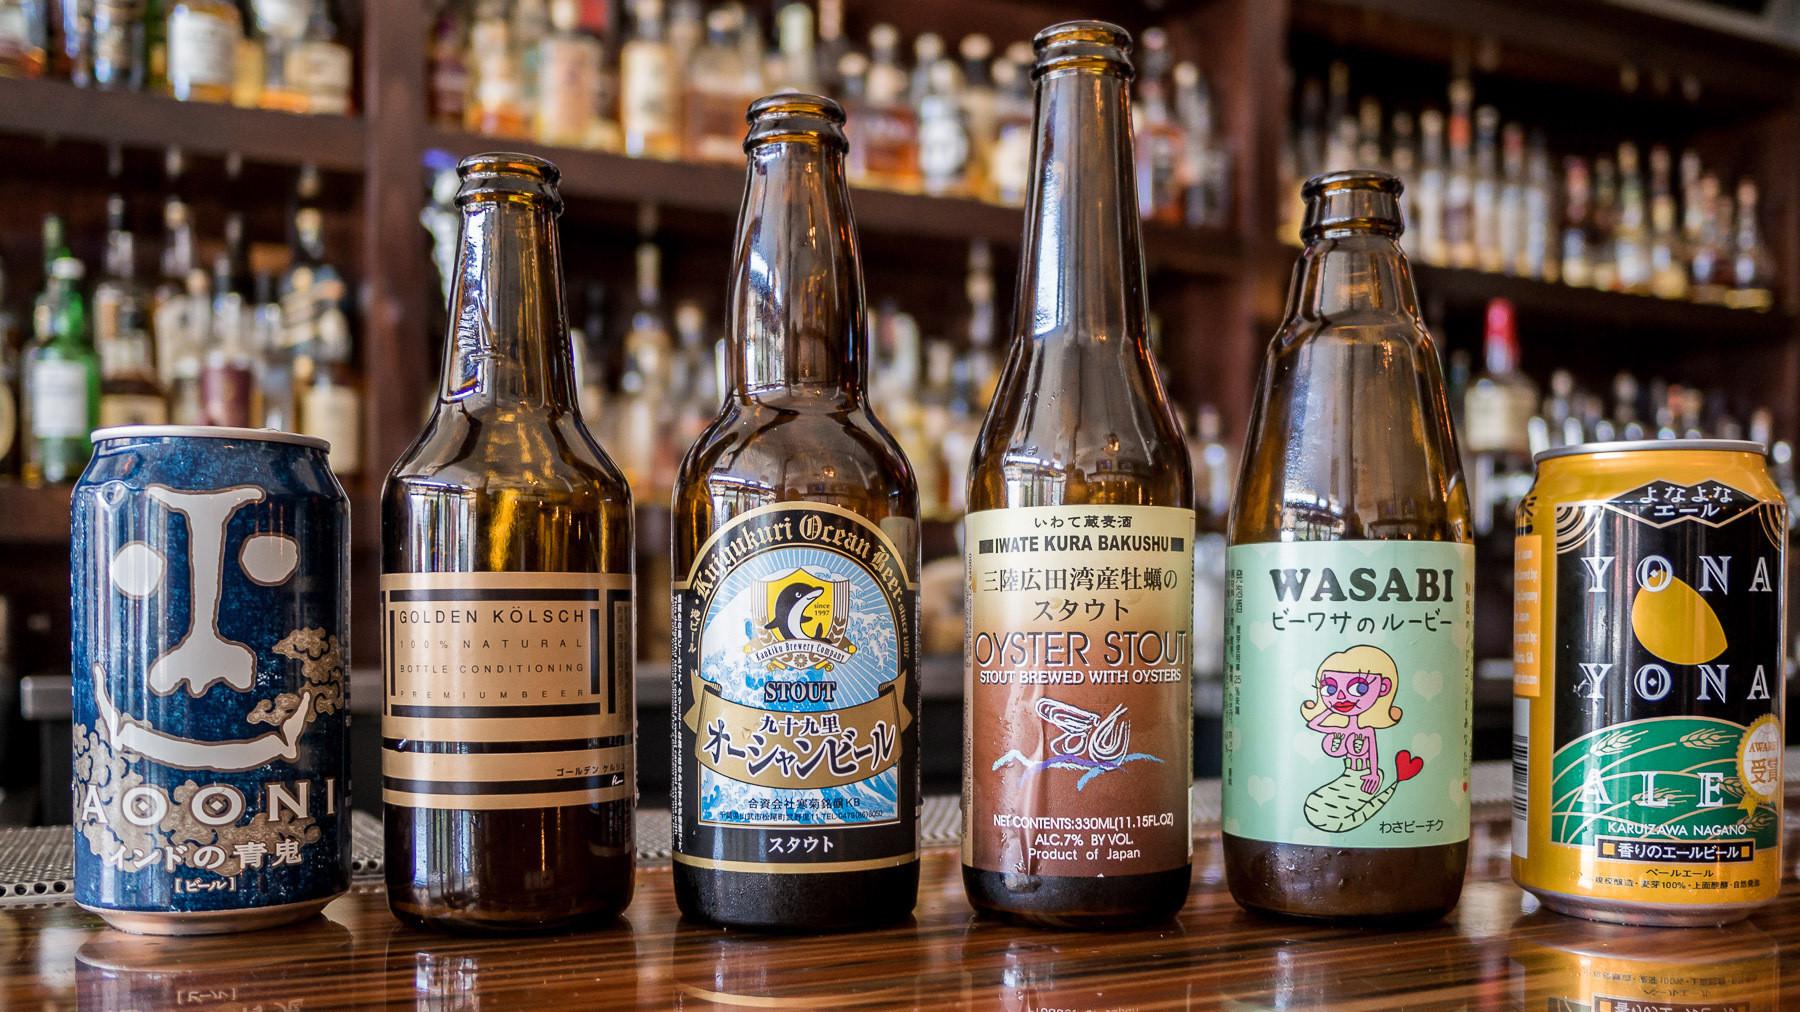 la-dd-japanese-craft-beer-far-bar-20150813.jpg